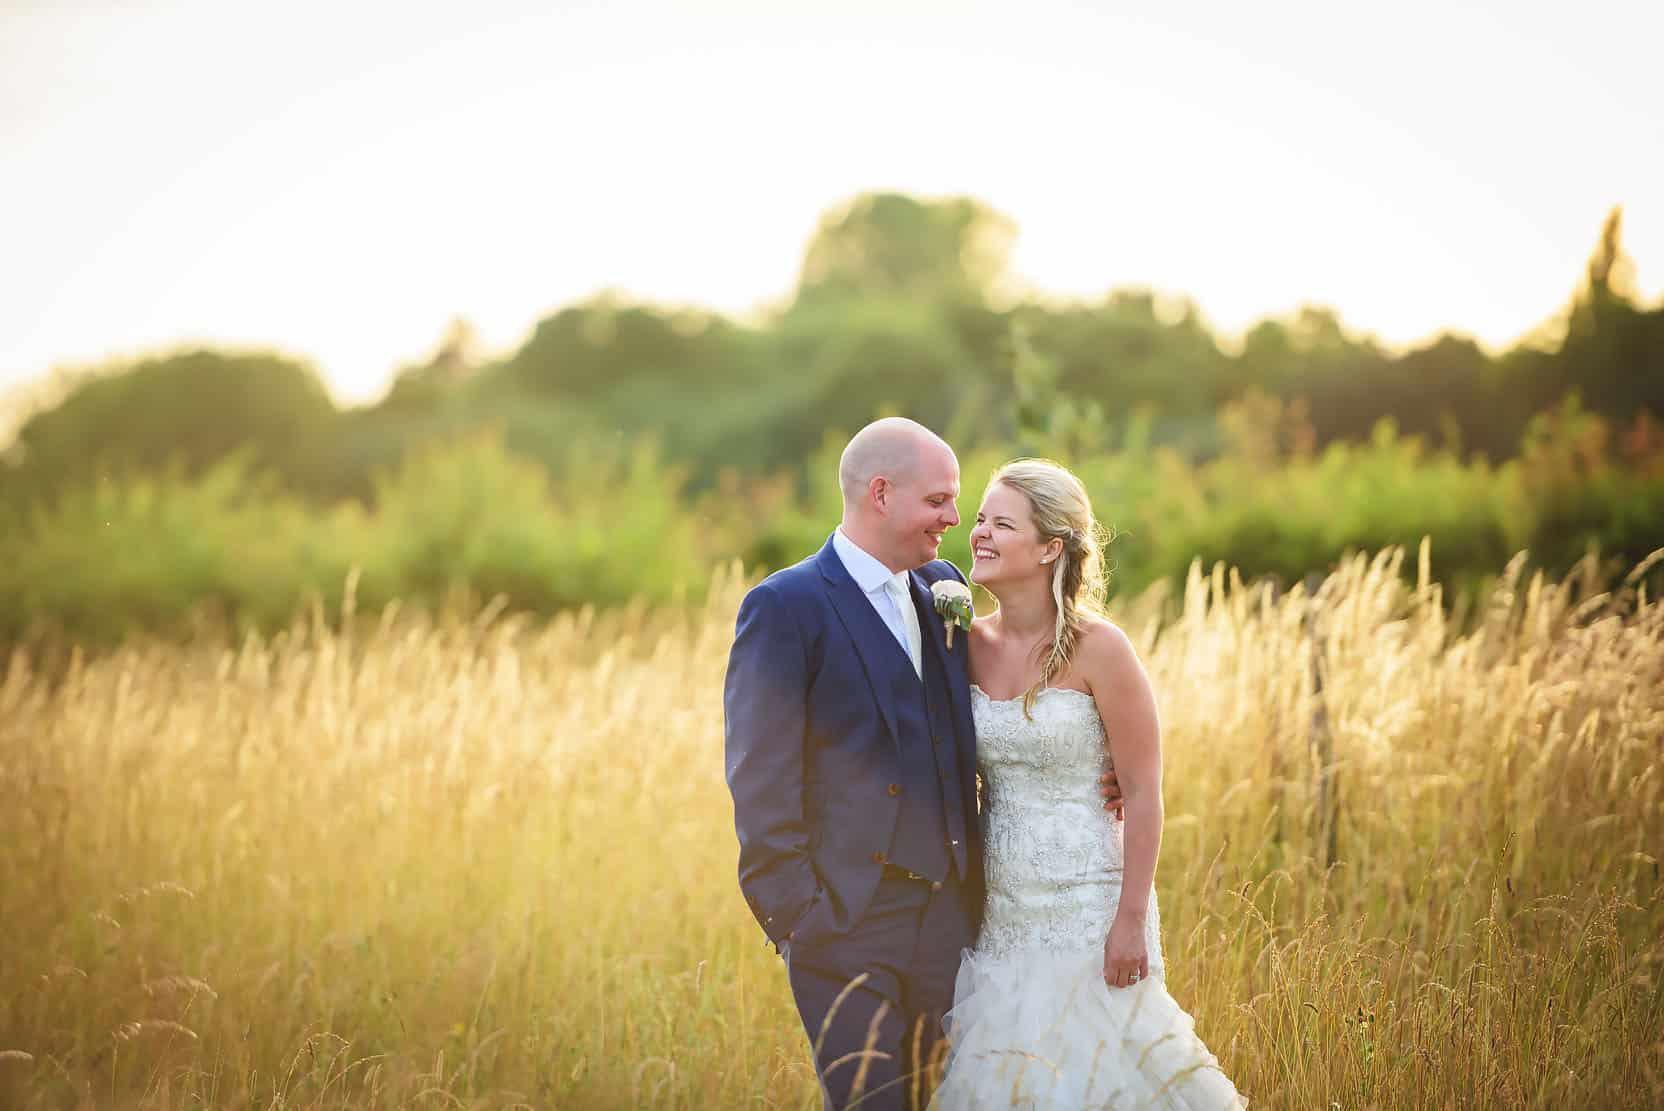 034_Maidens_Barn_Wedding_Essex_NJ_Justin_Bailey_Photography